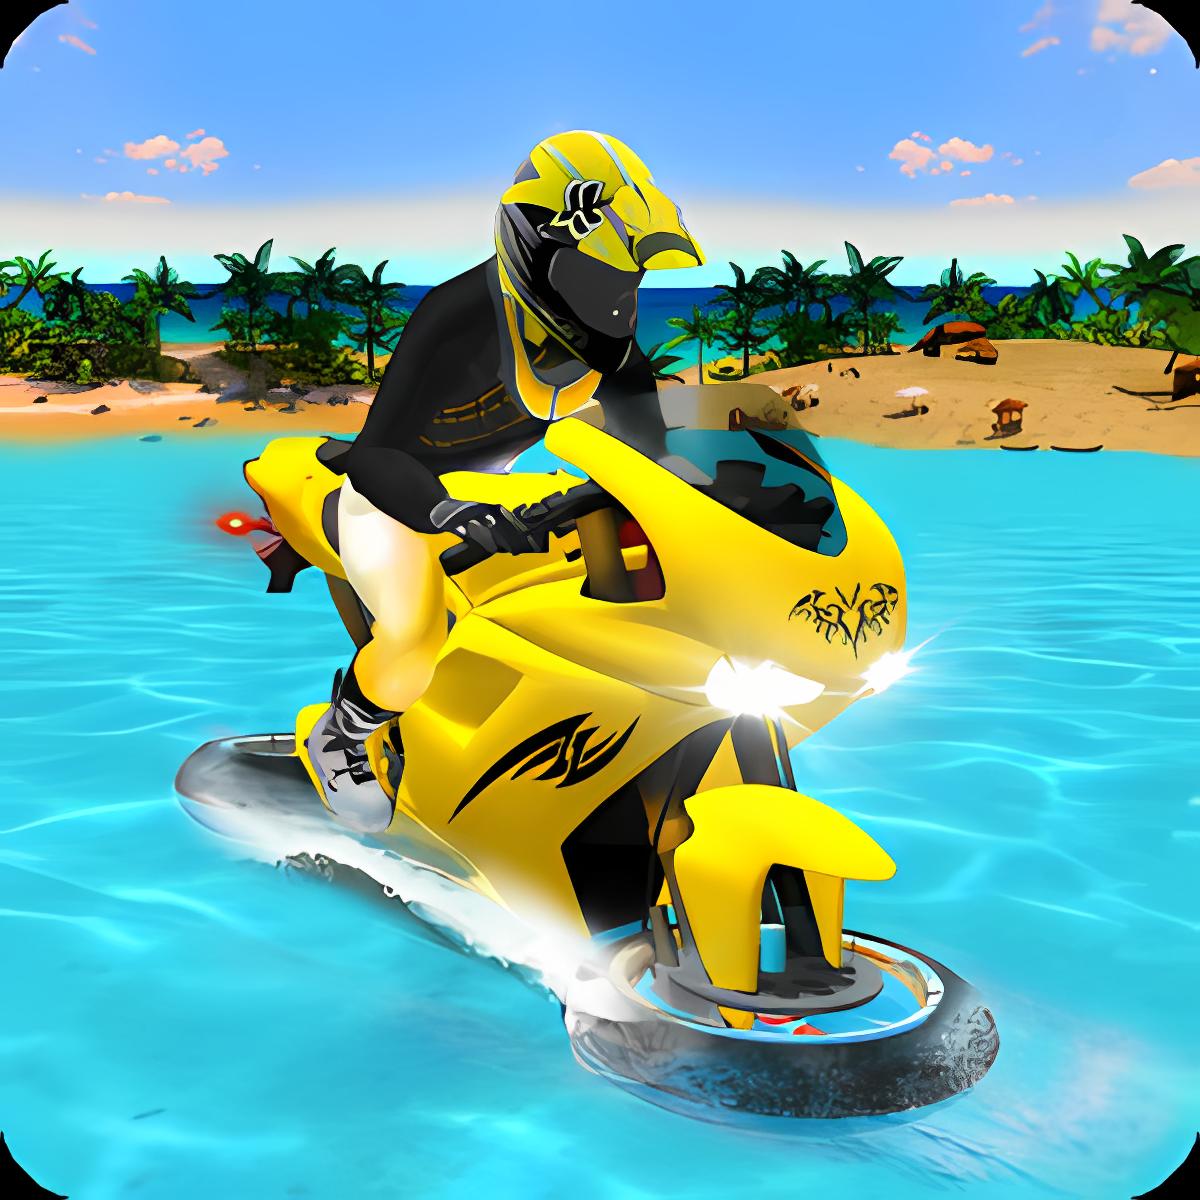 Water Surfer Motorbike Racer 1.0